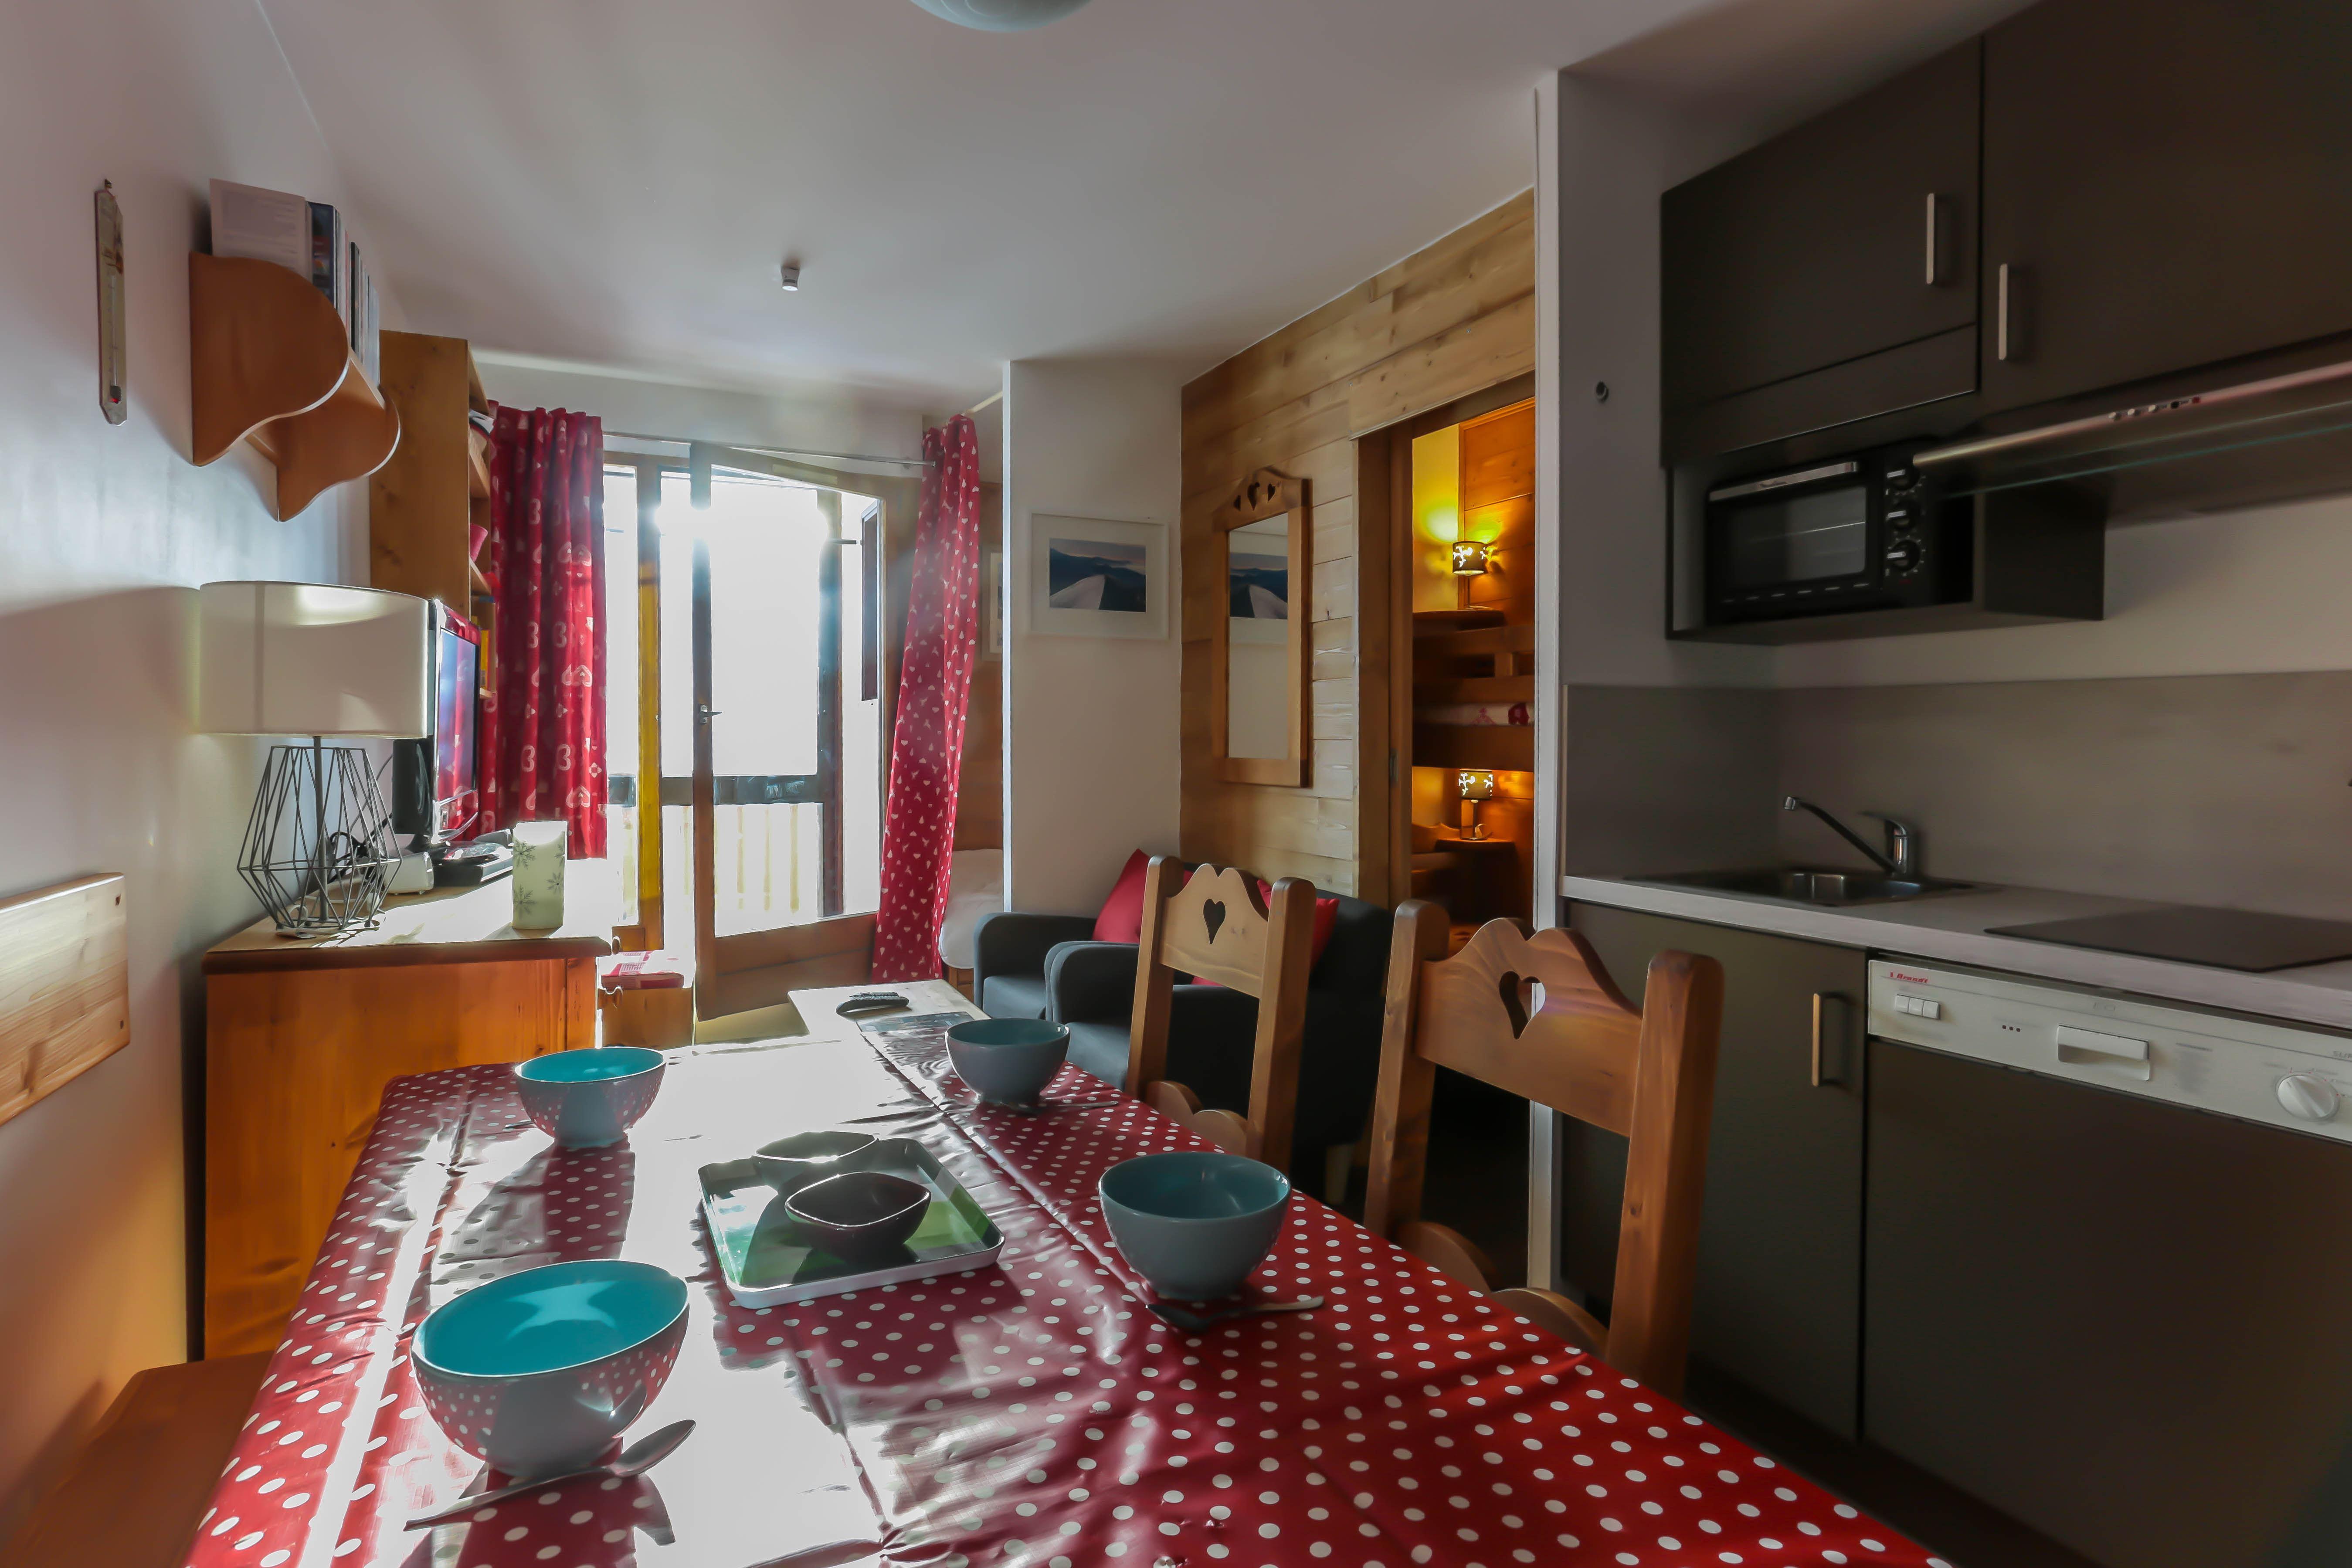 Cimes de Caron 1200 > 2 Rooms + Cabin - 4 Persons - 2 Gold Snowflakes (Ma Clé IMMO)